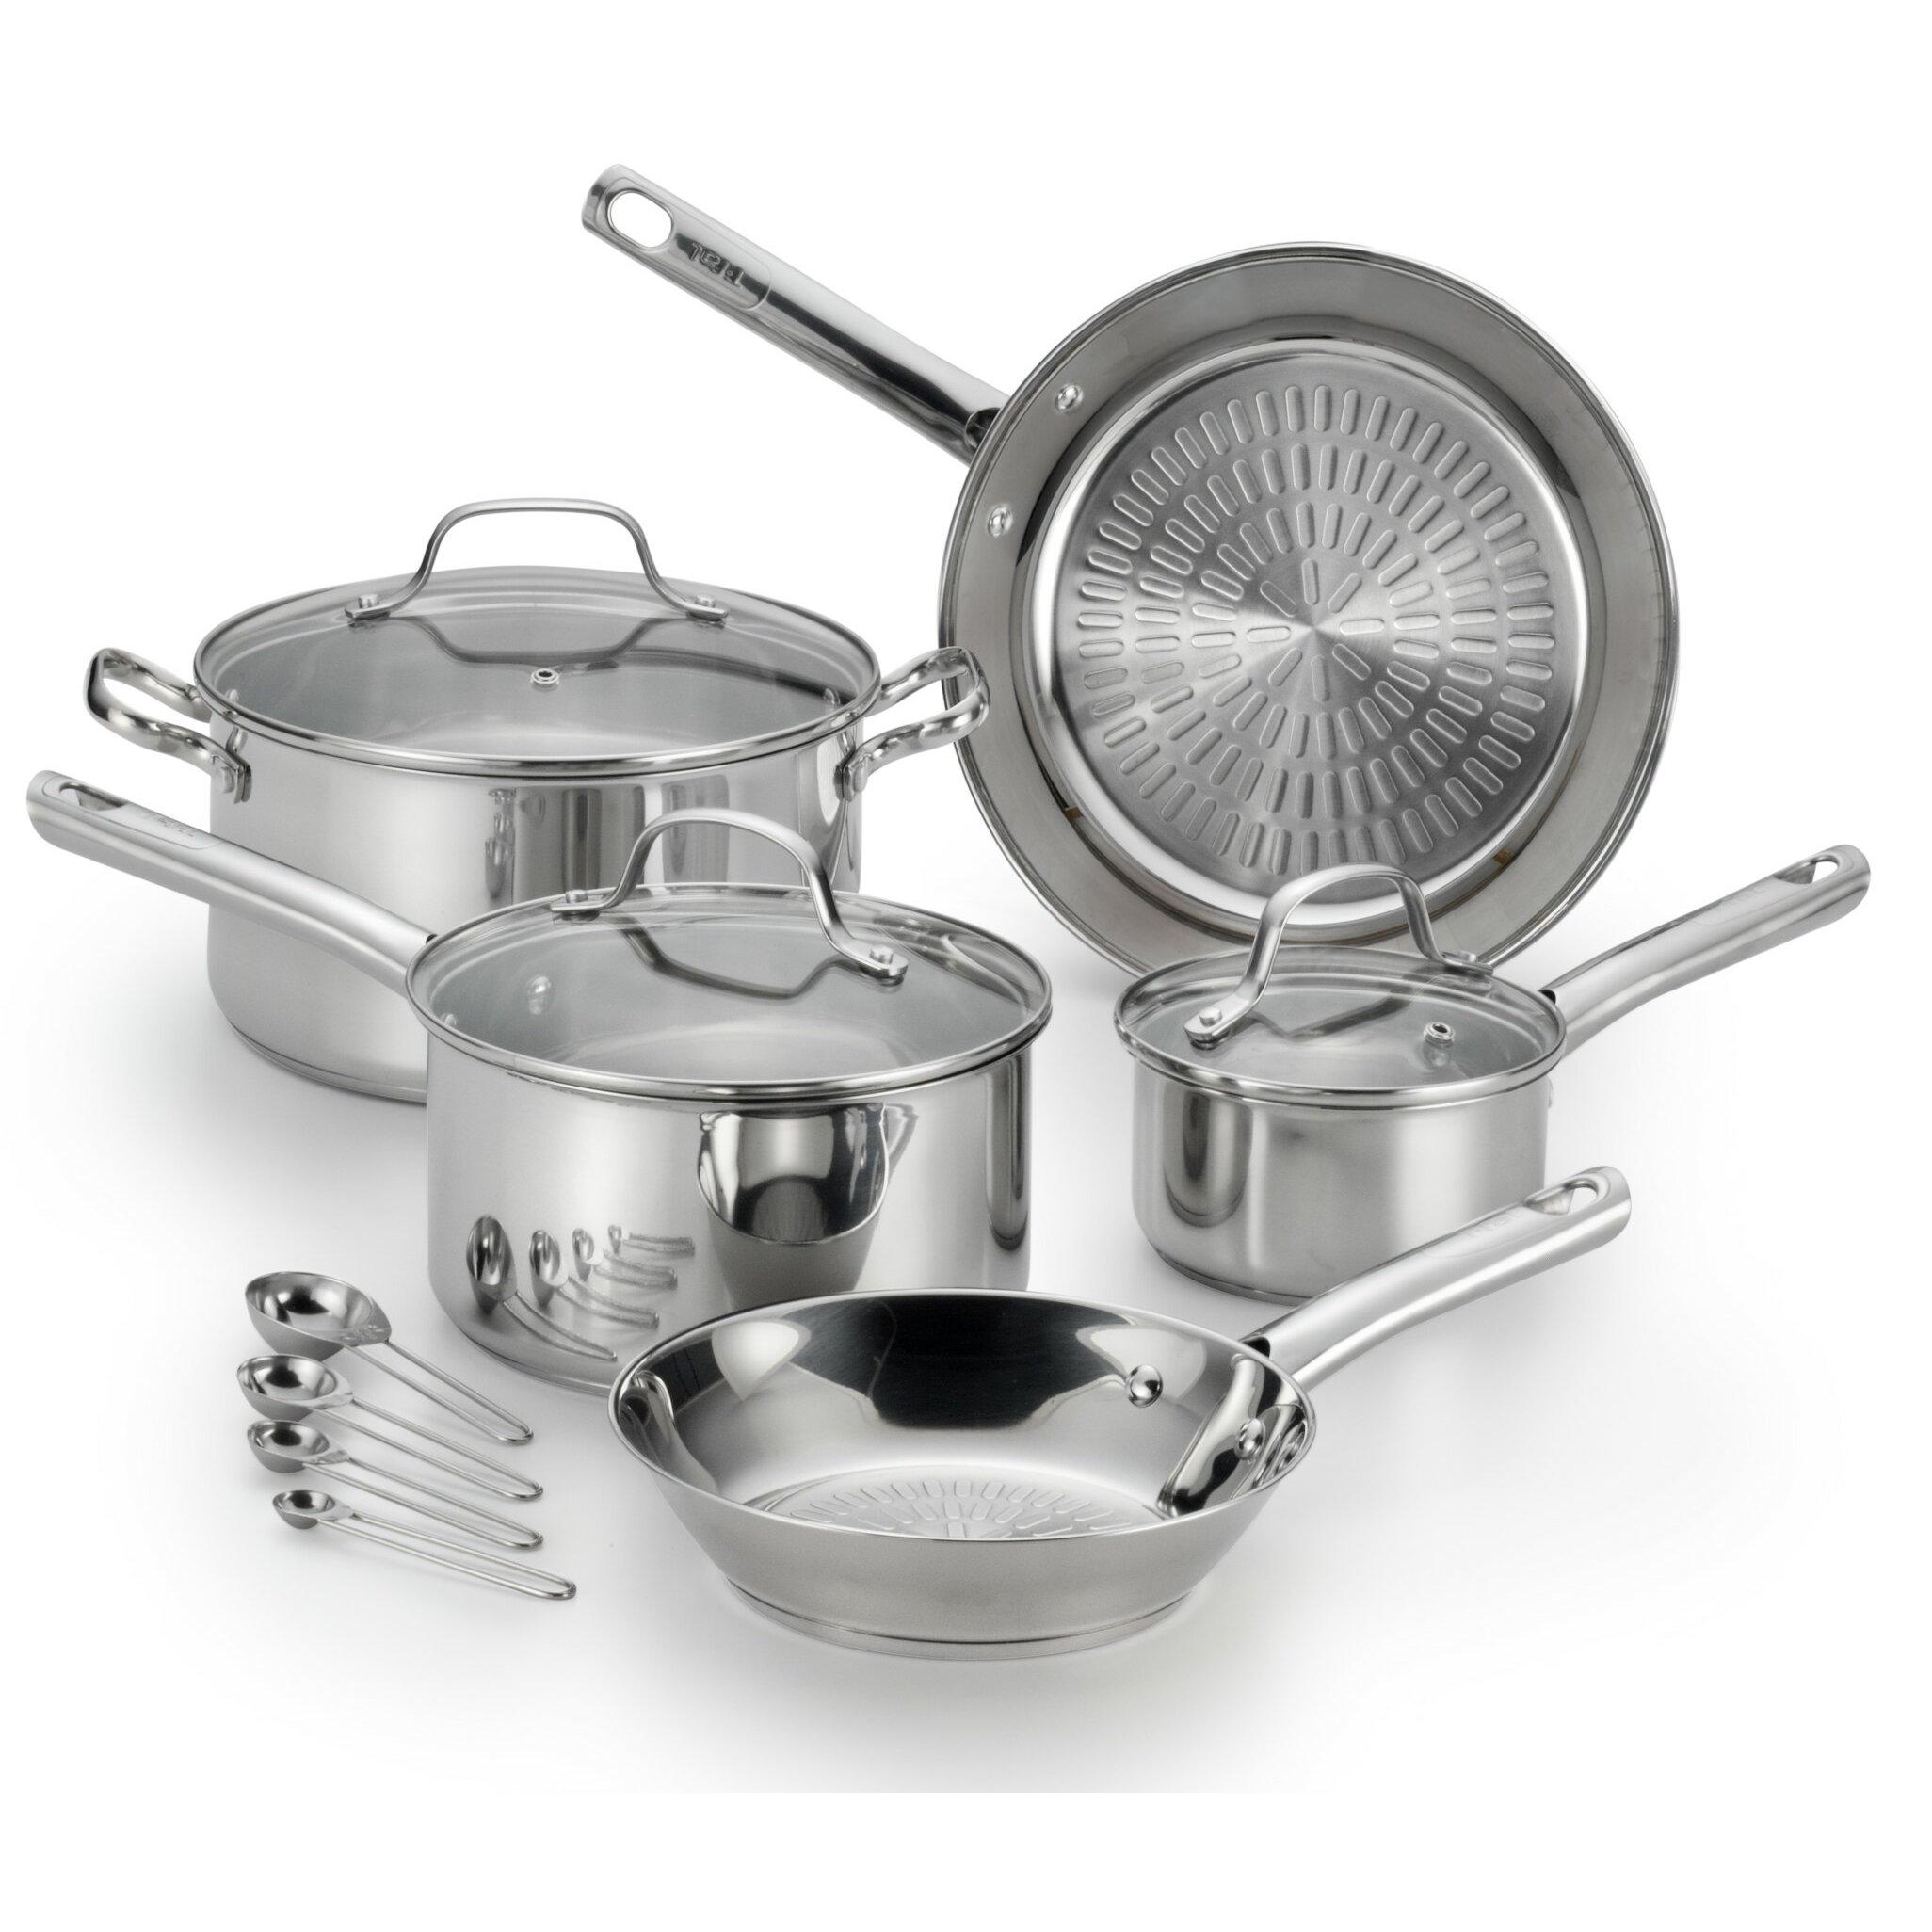 t fal performa stainless steel 12 piece cookware set reviews wayfair. Black Bedroom Furniture Sets. Home Design Ideas